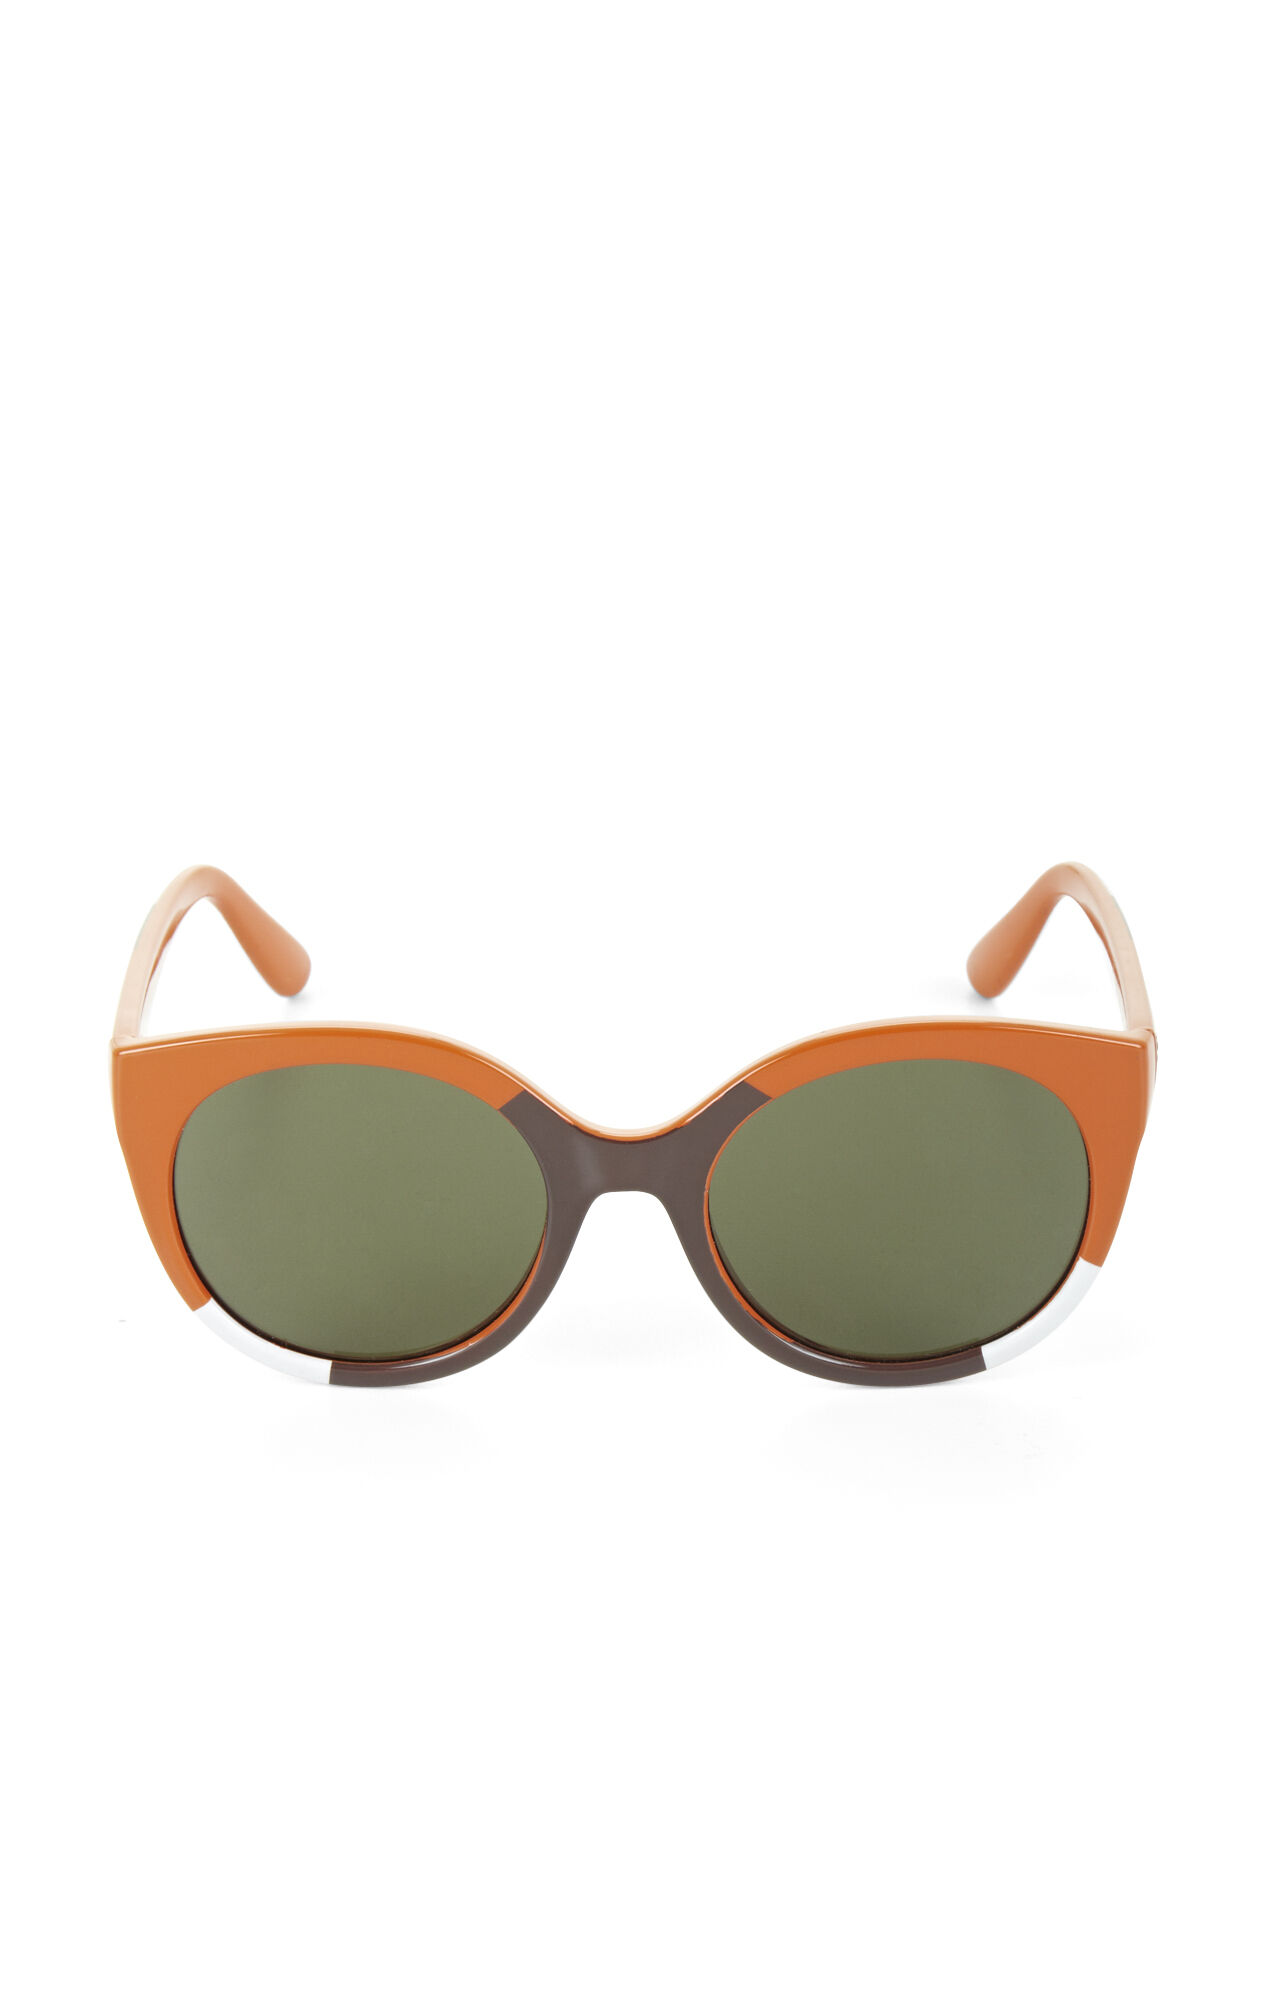 Color-Blocked Round Sunglasses